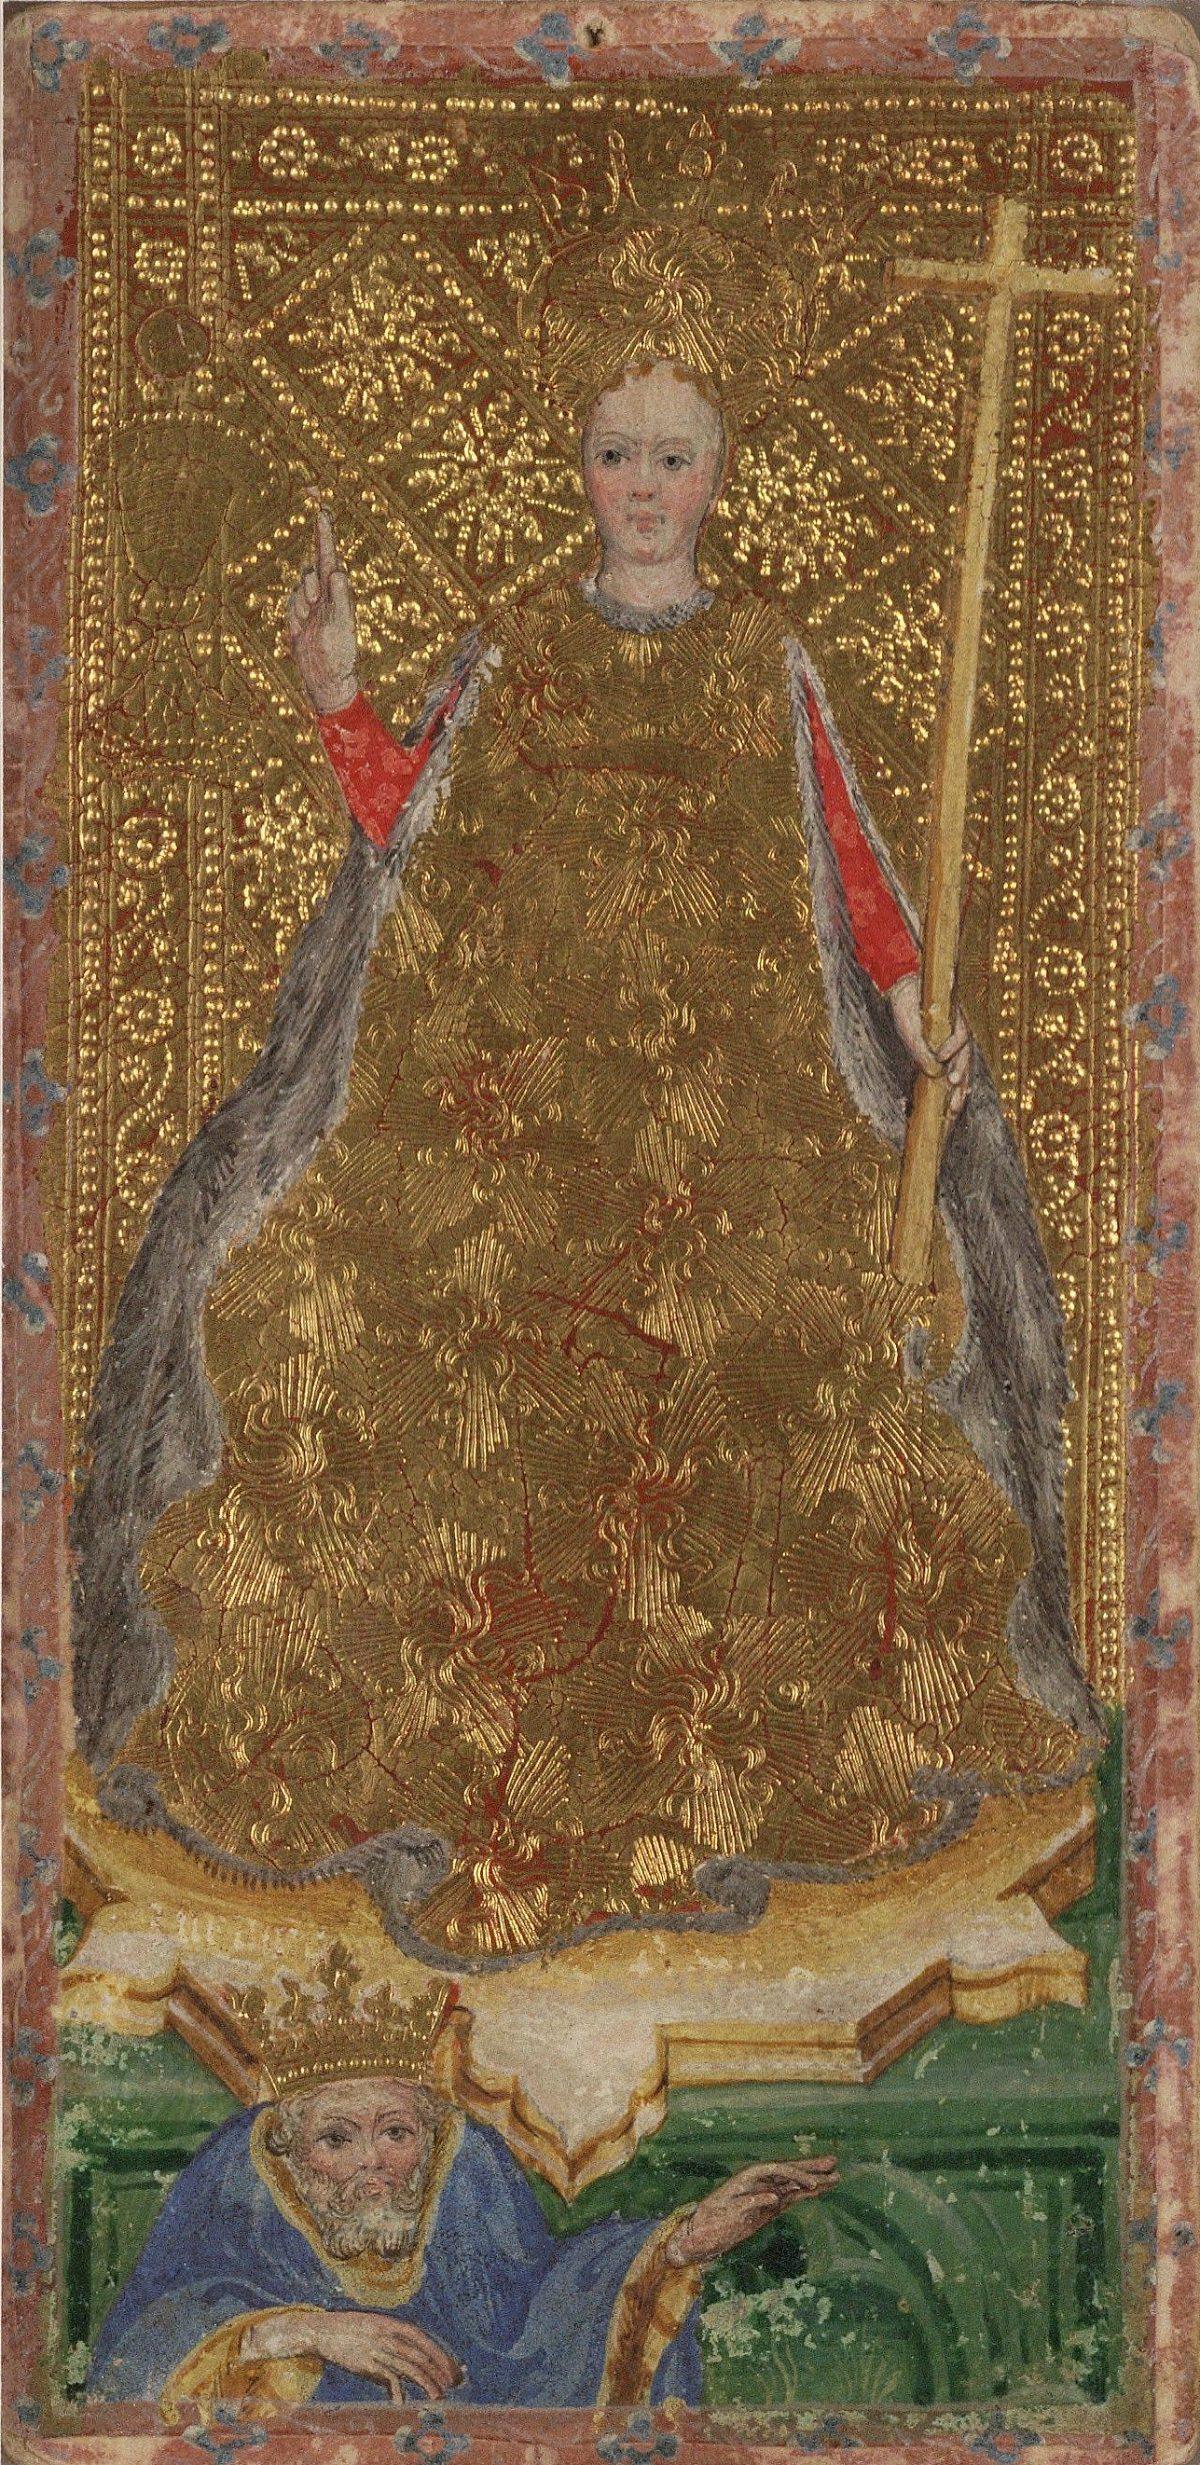 female knight tarot card from the visconti tarot deck